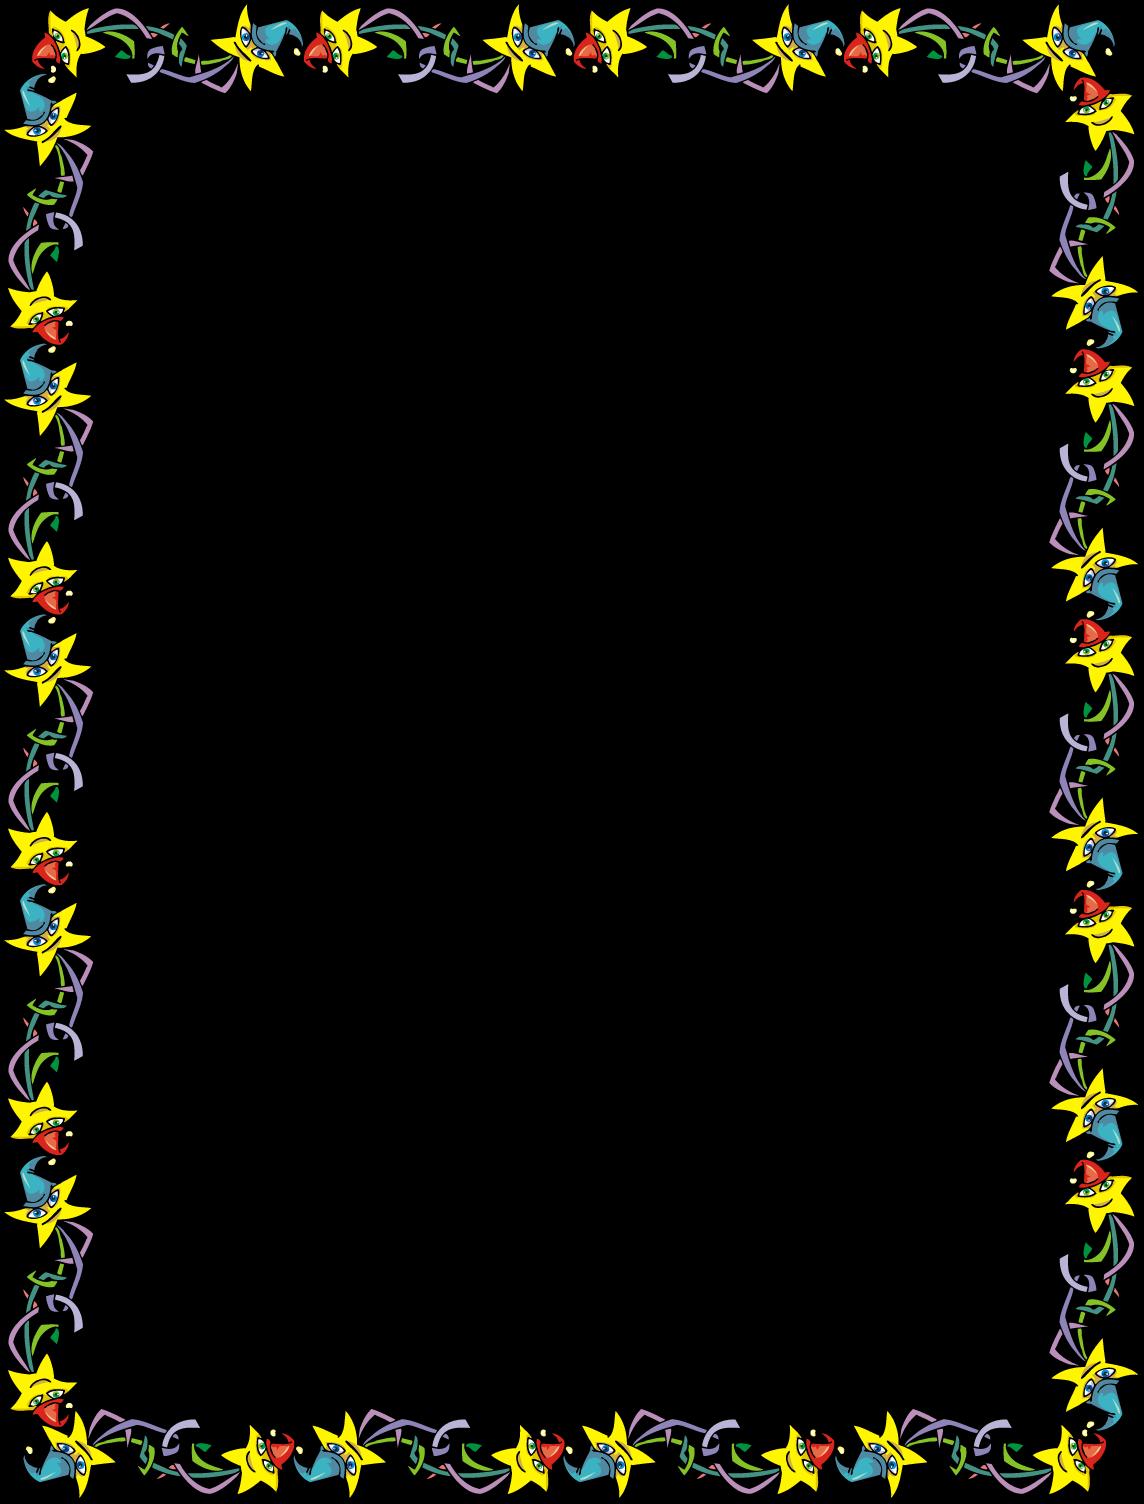 Border clip art invitation. Free star party image